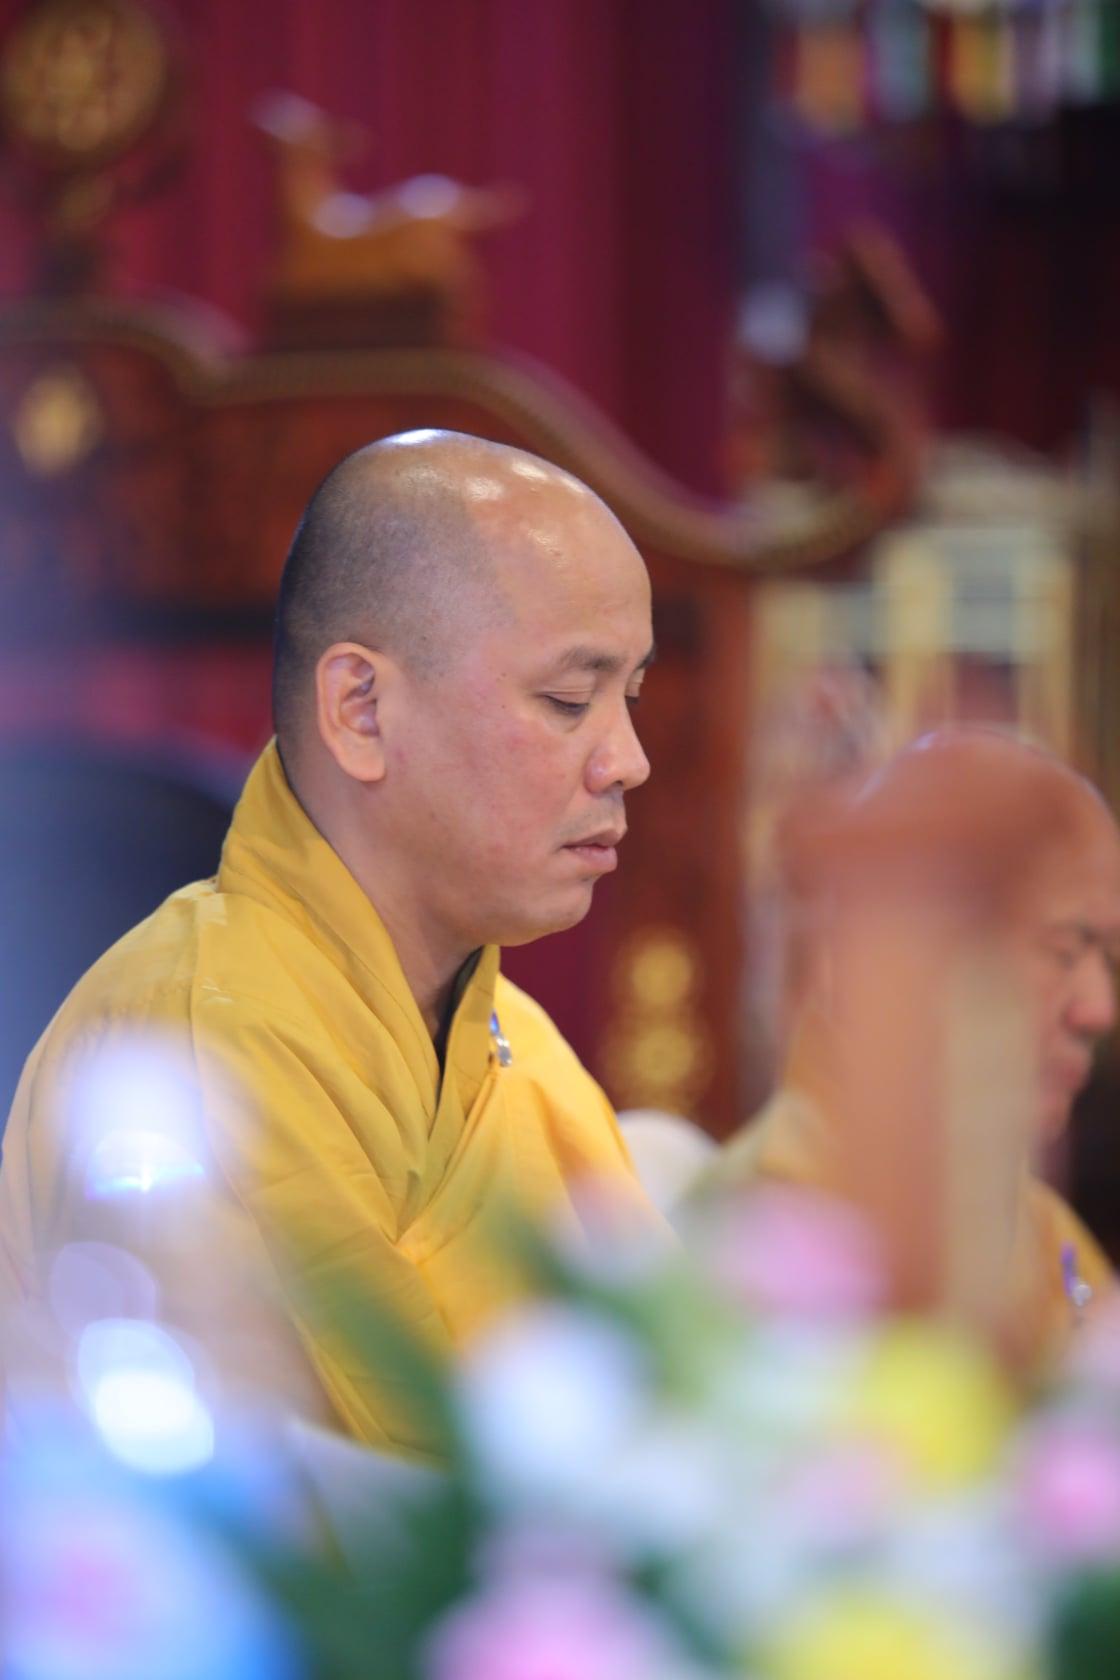 Thang Nghiem Dai Gioi Dan IV (89)